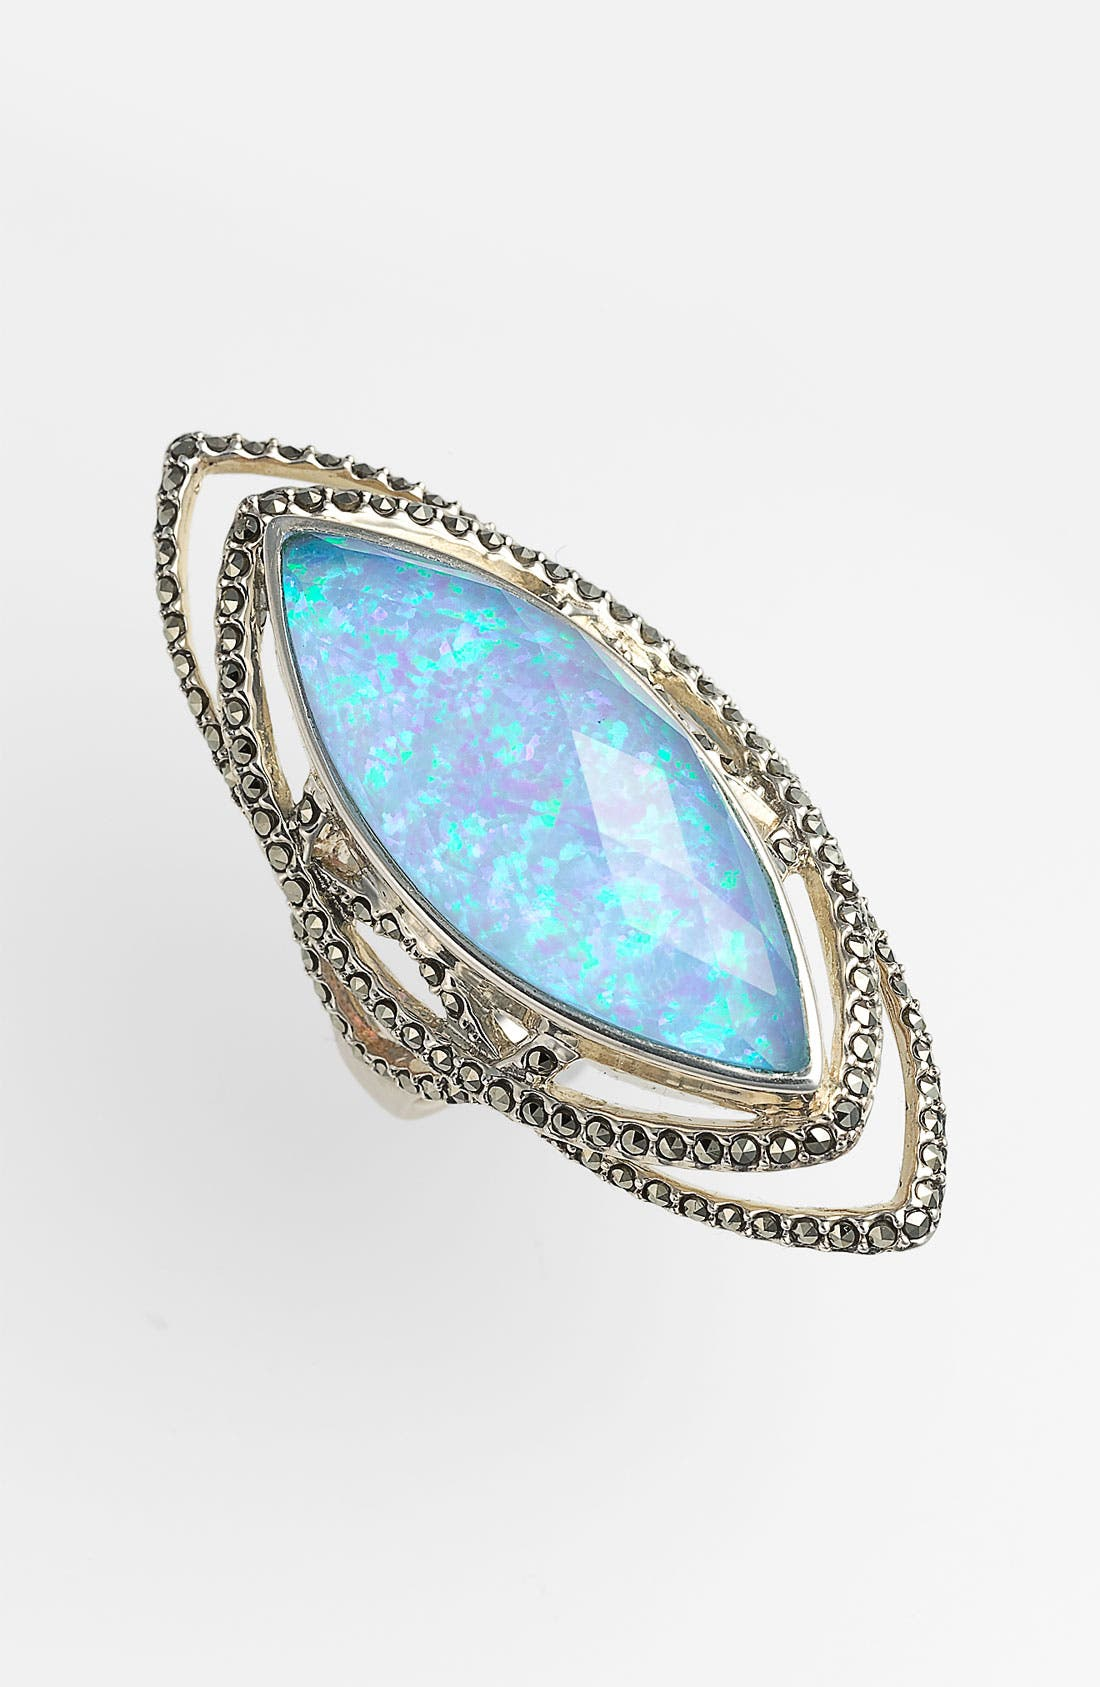 Main Image - Judith Jack 'Lagoon' Gilson Opal Ring